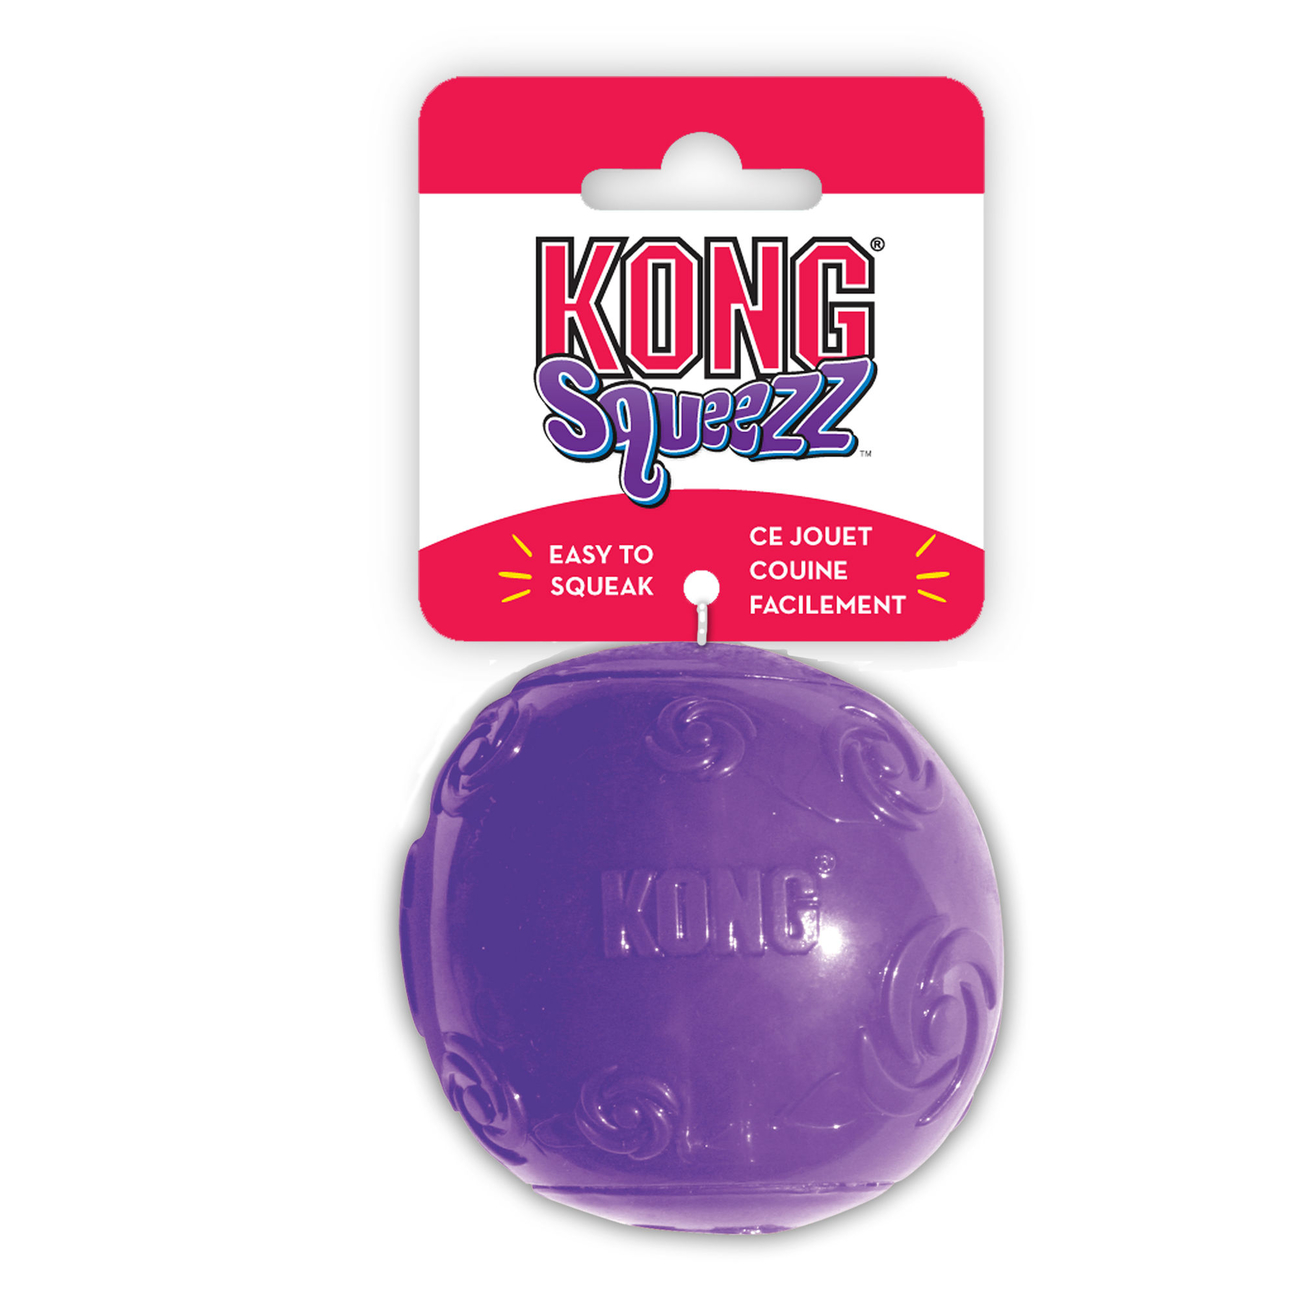 KONG Squeezz Ball Hundespielzeug, Bild 5